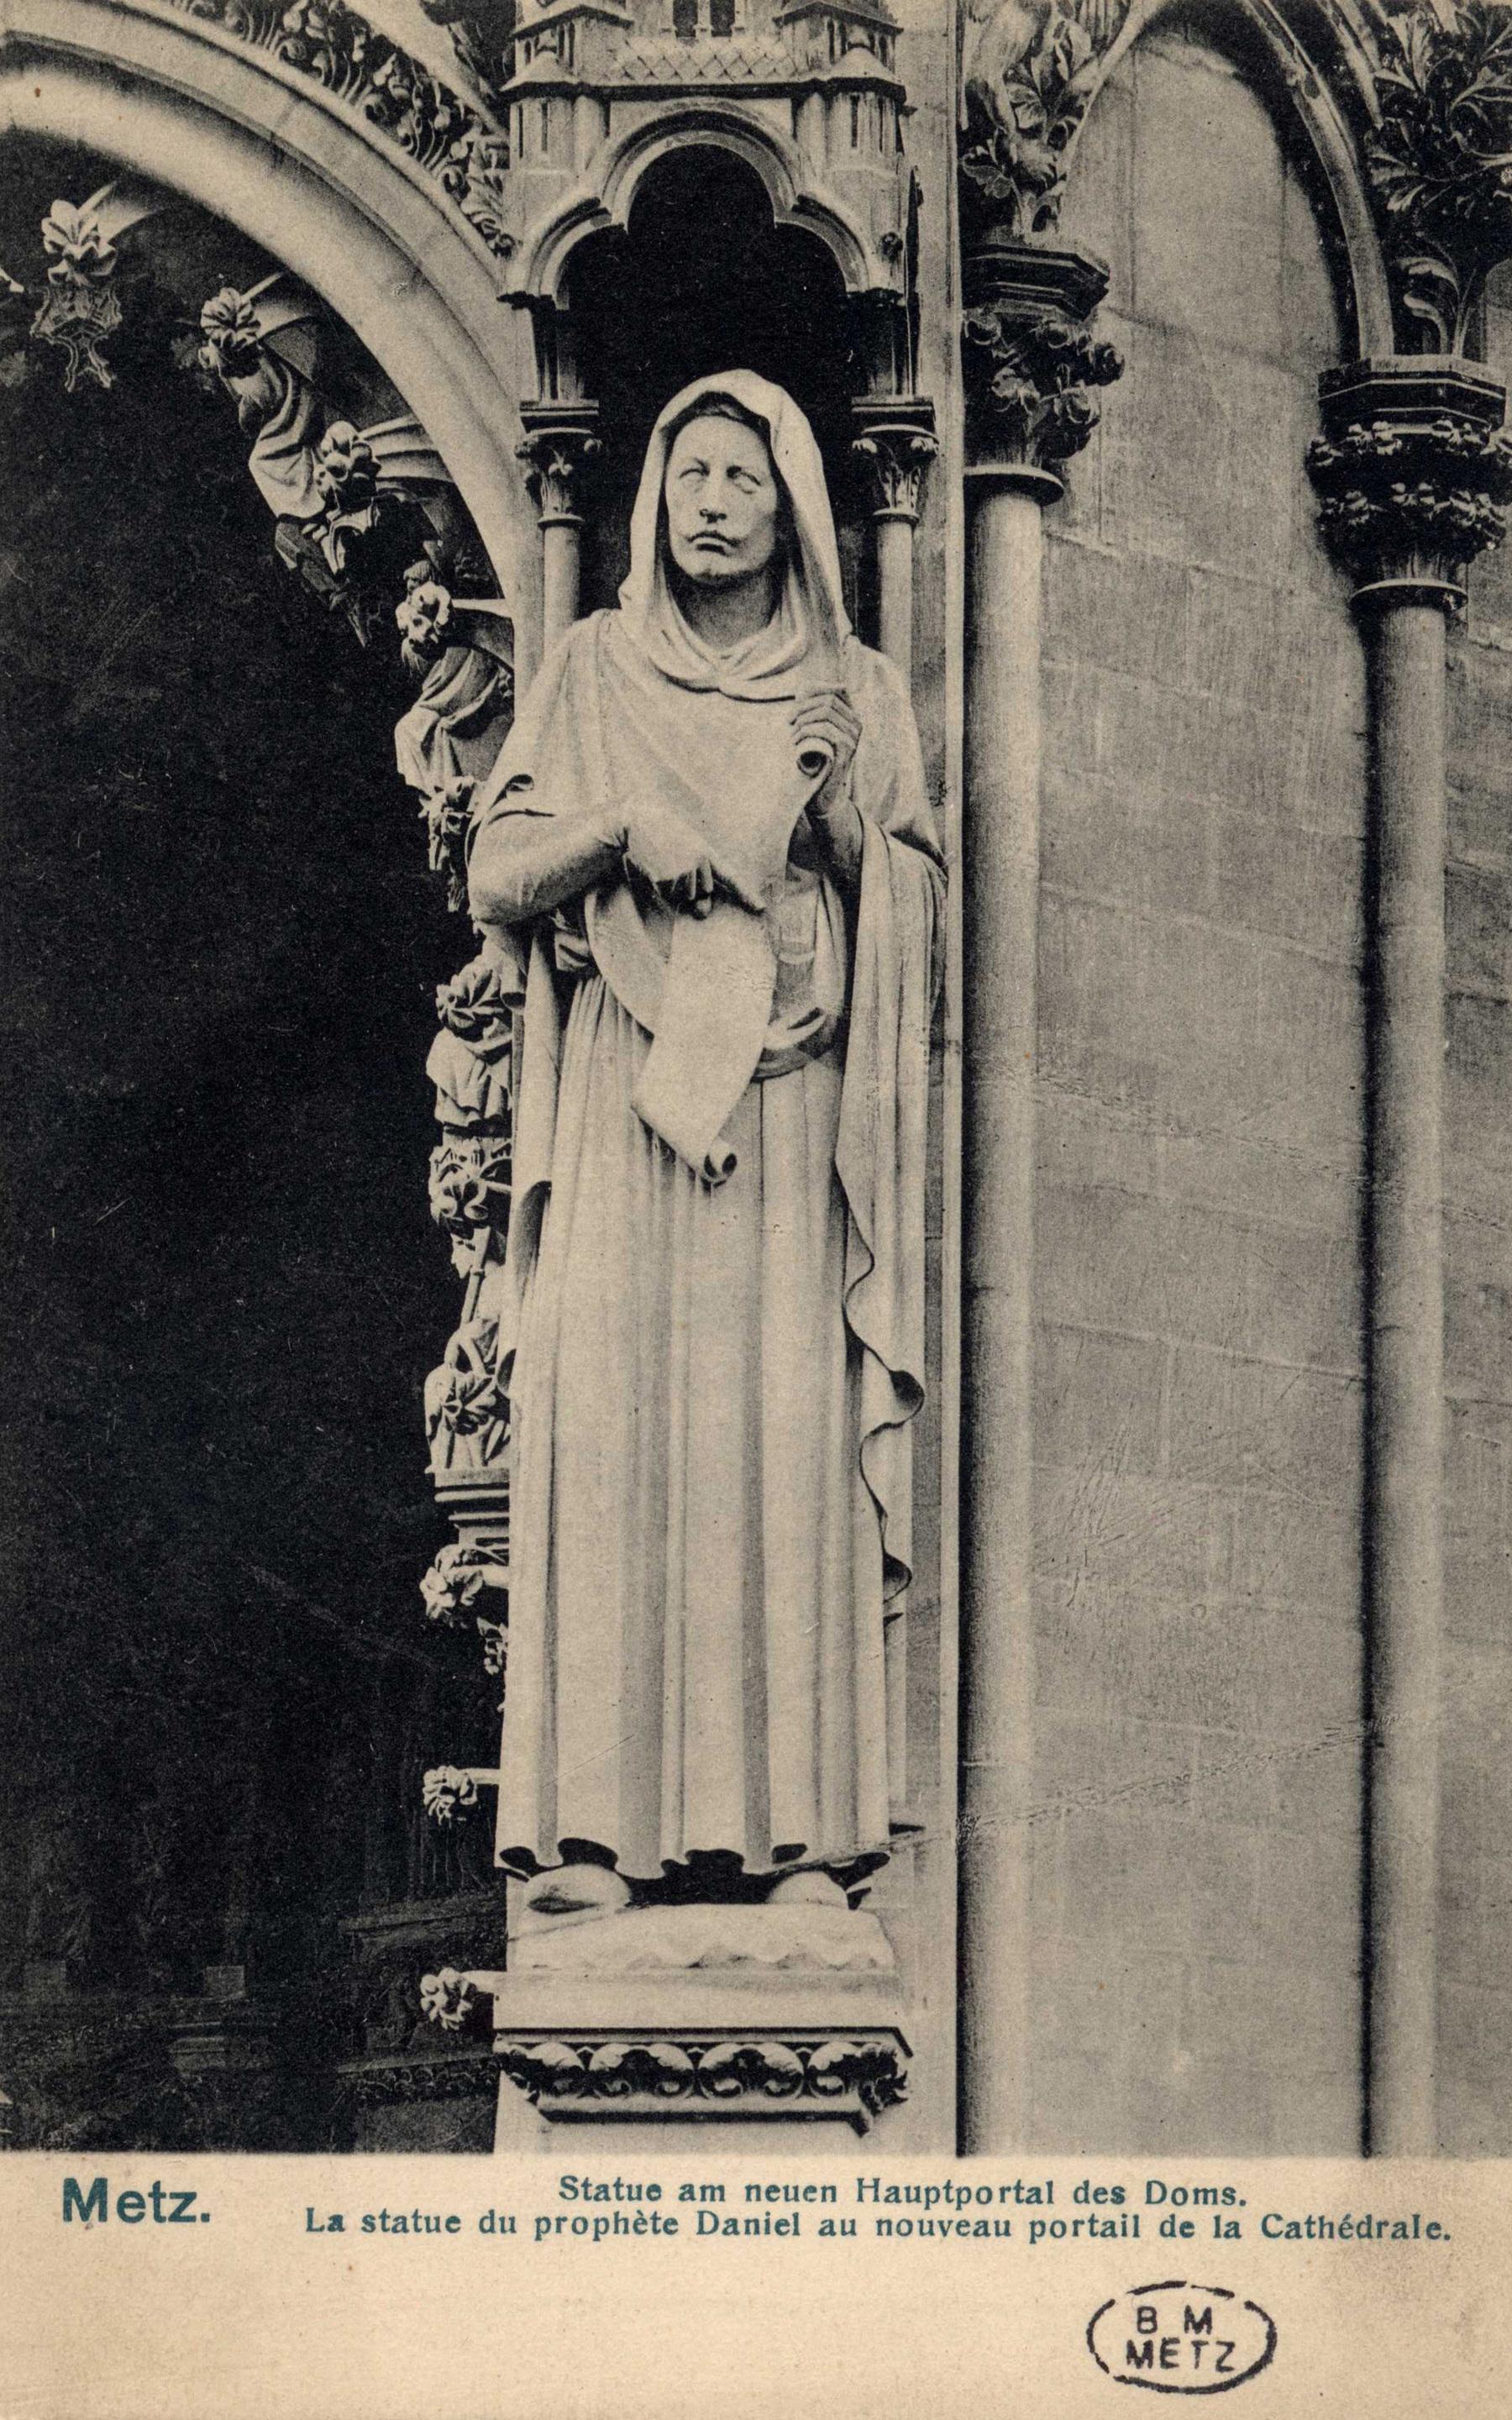 Contenu du Metz. Statue am neuen Hautportal des Doms.